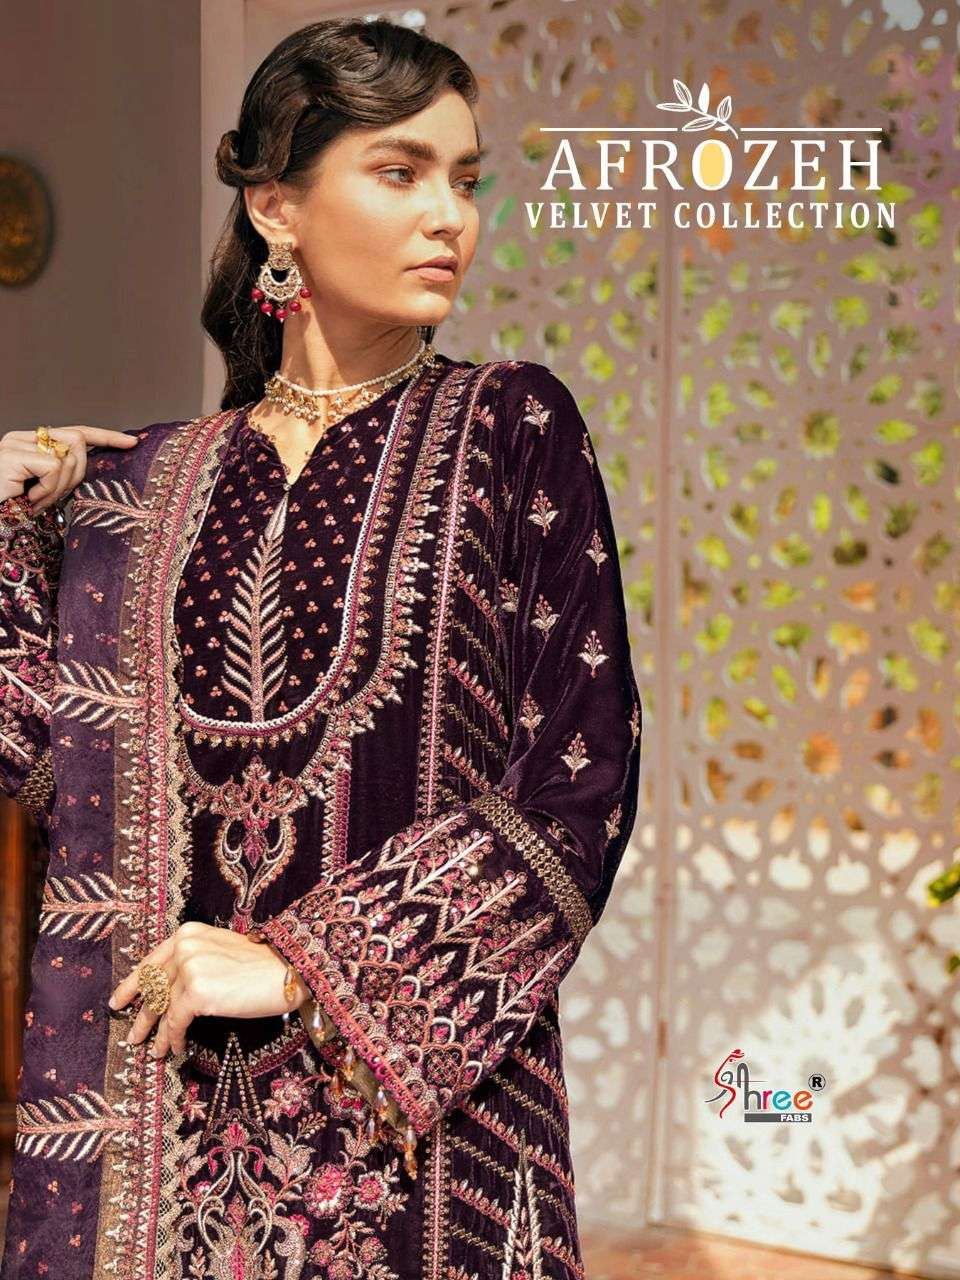 Shree fabs Afrozeh Velvet Pakistani Suit Collection at Best Rate